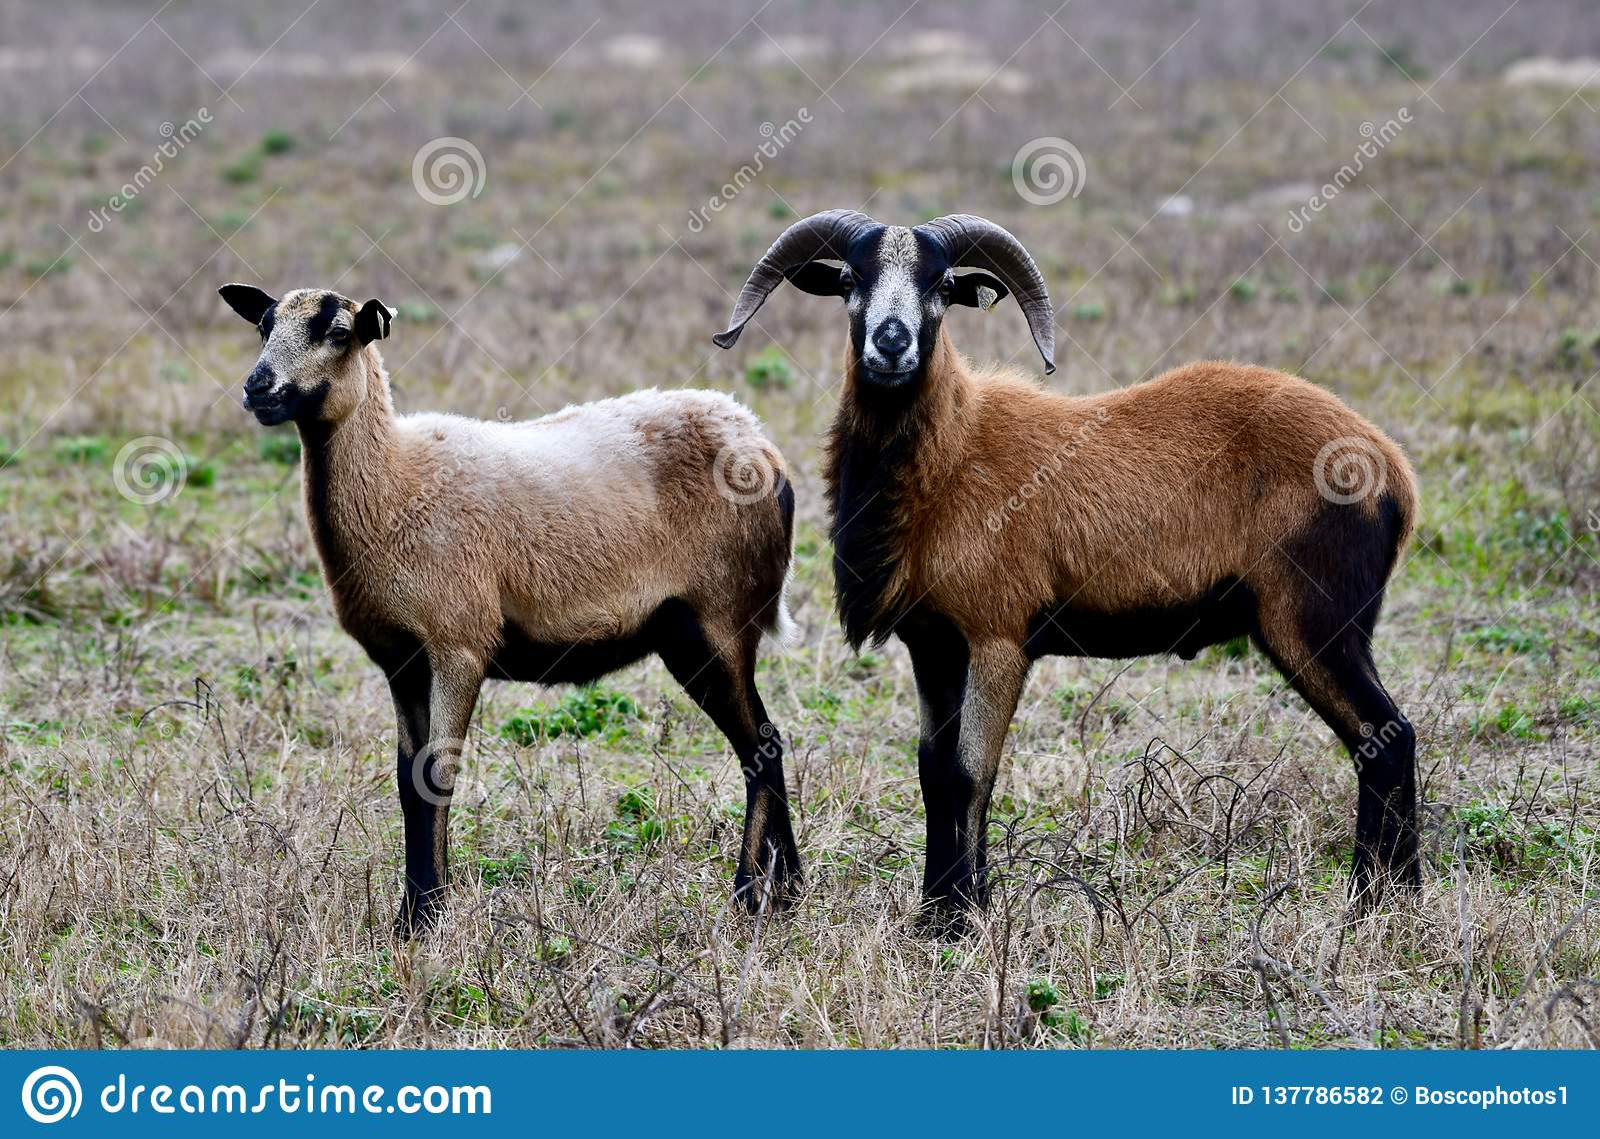 Portrait of a Ram Barbados Black Belly Sheep